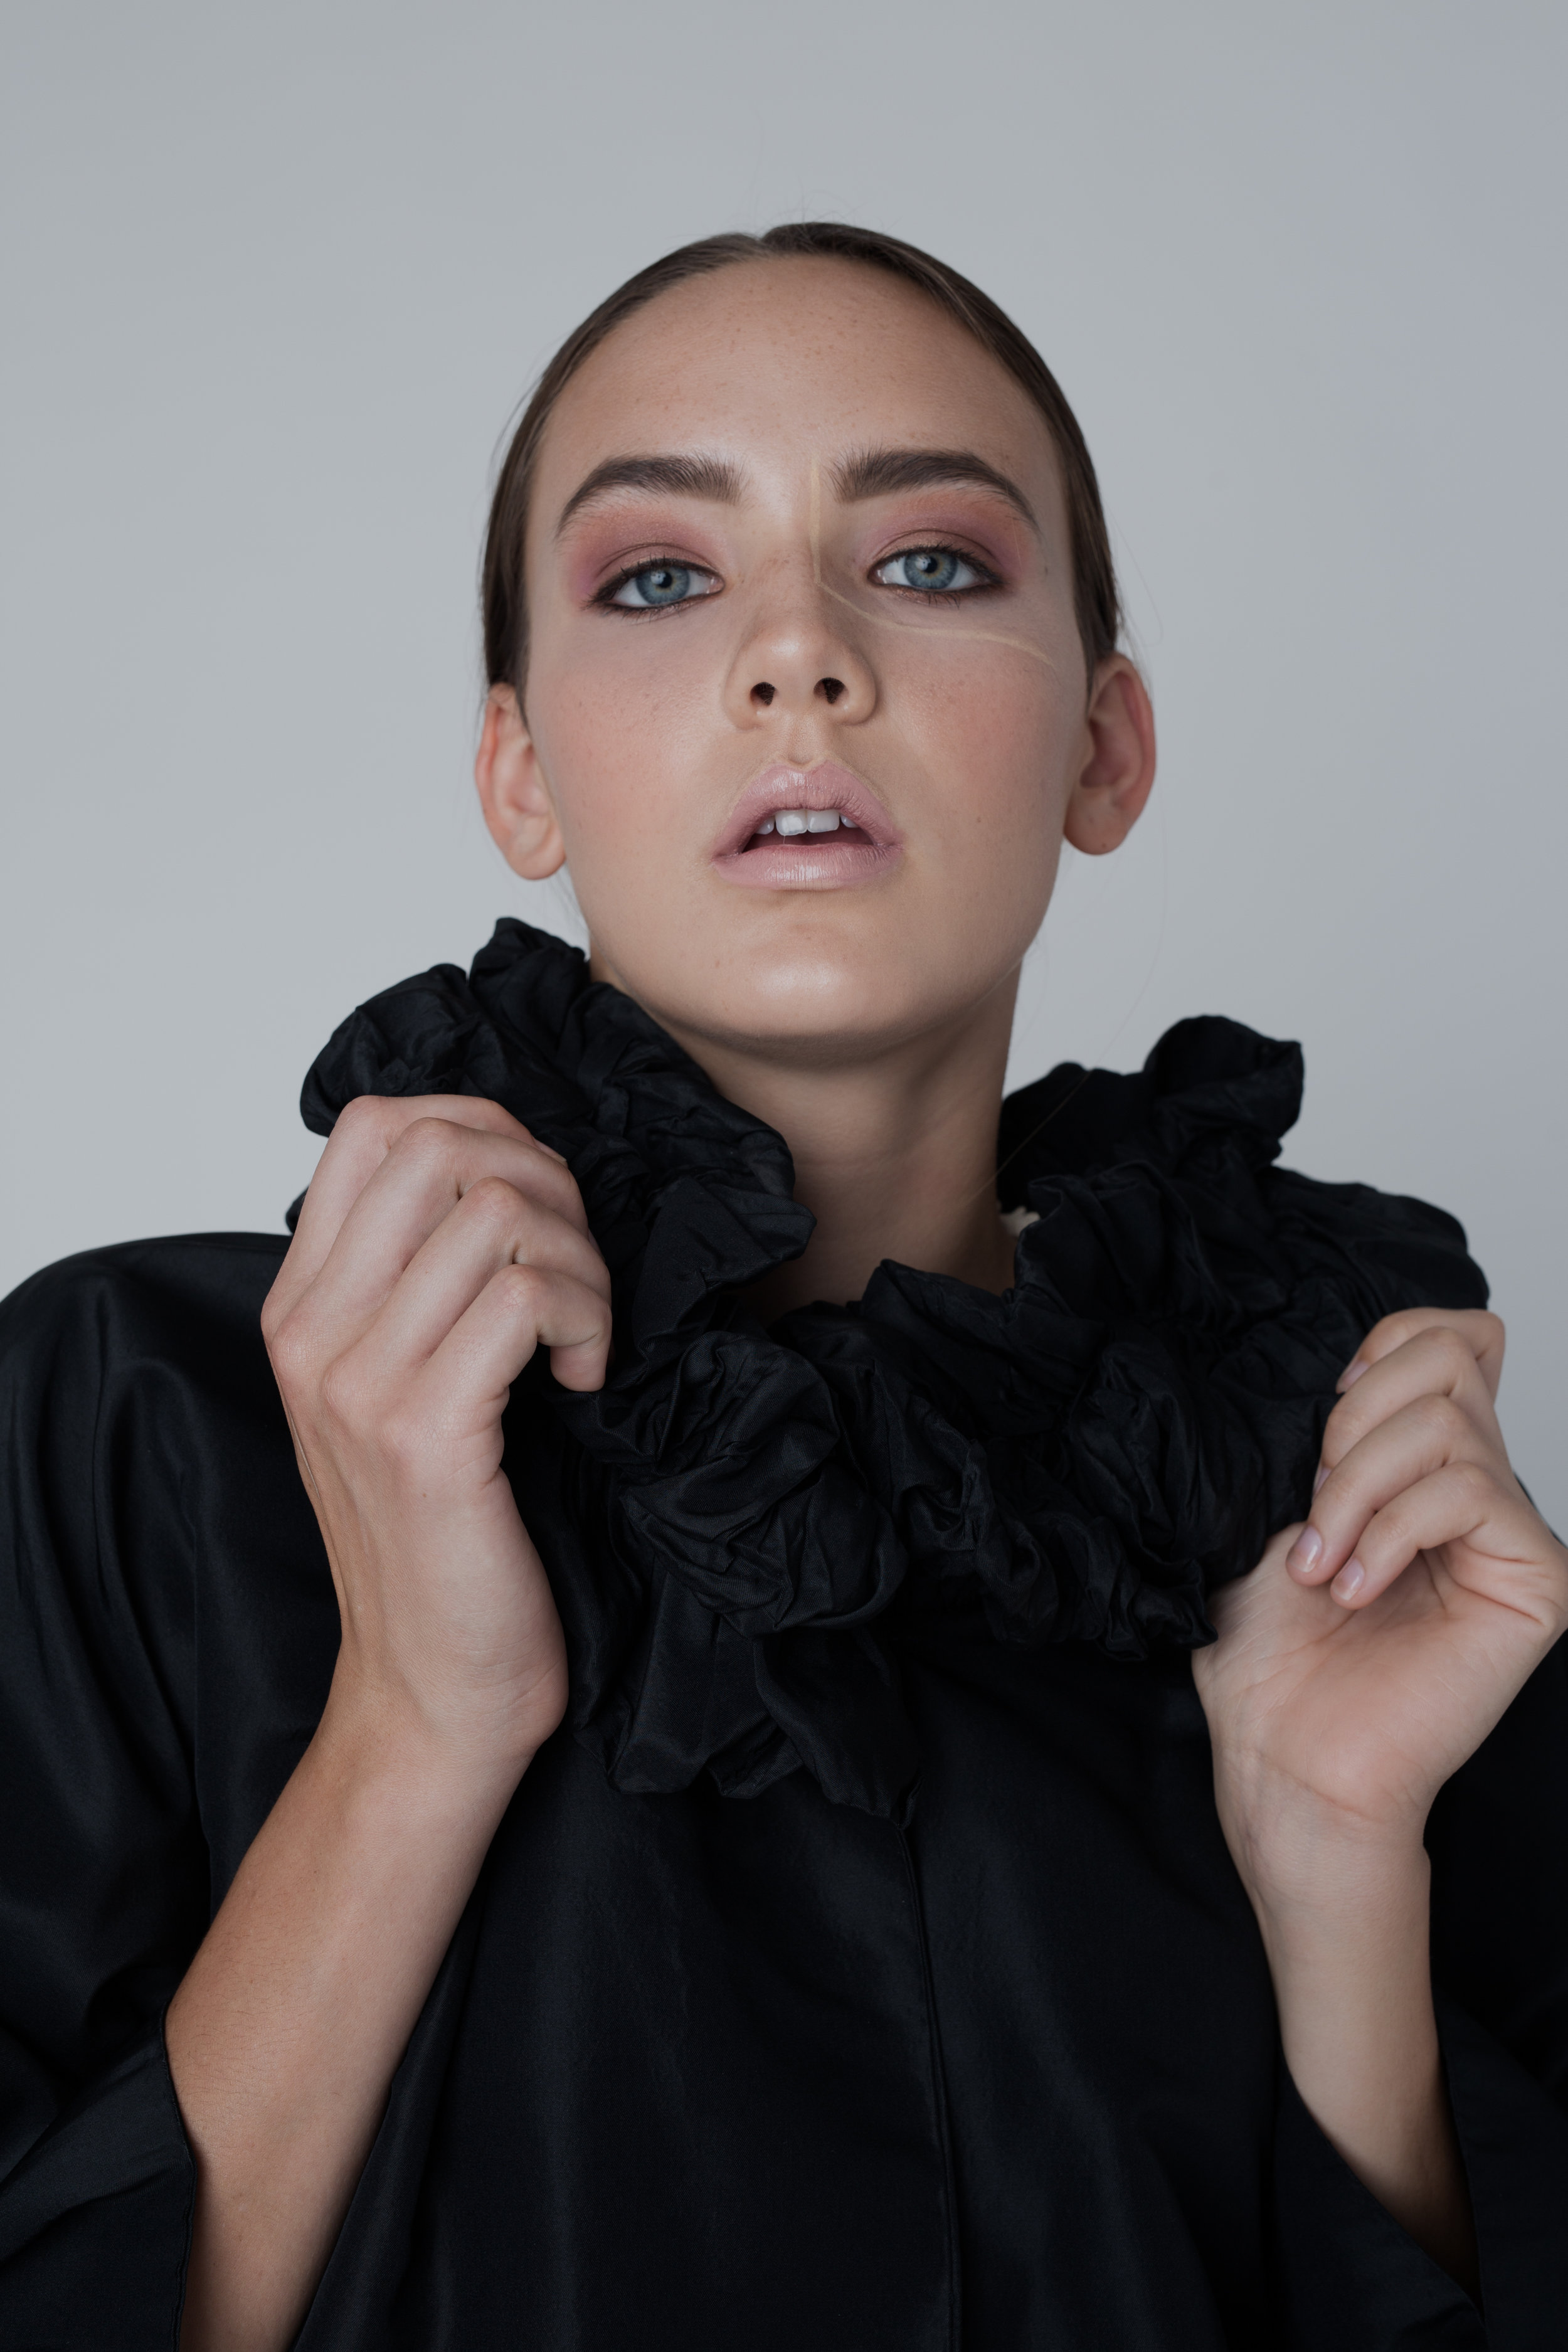 Photography  @ajsongstudio  Stylist  @_prey_   @prey_public  Model  @izpawline   @wilhelminamodels  Makeup  @anna.szeto.mua  Production  @zoe797979  Garment  @civviesnewhaven